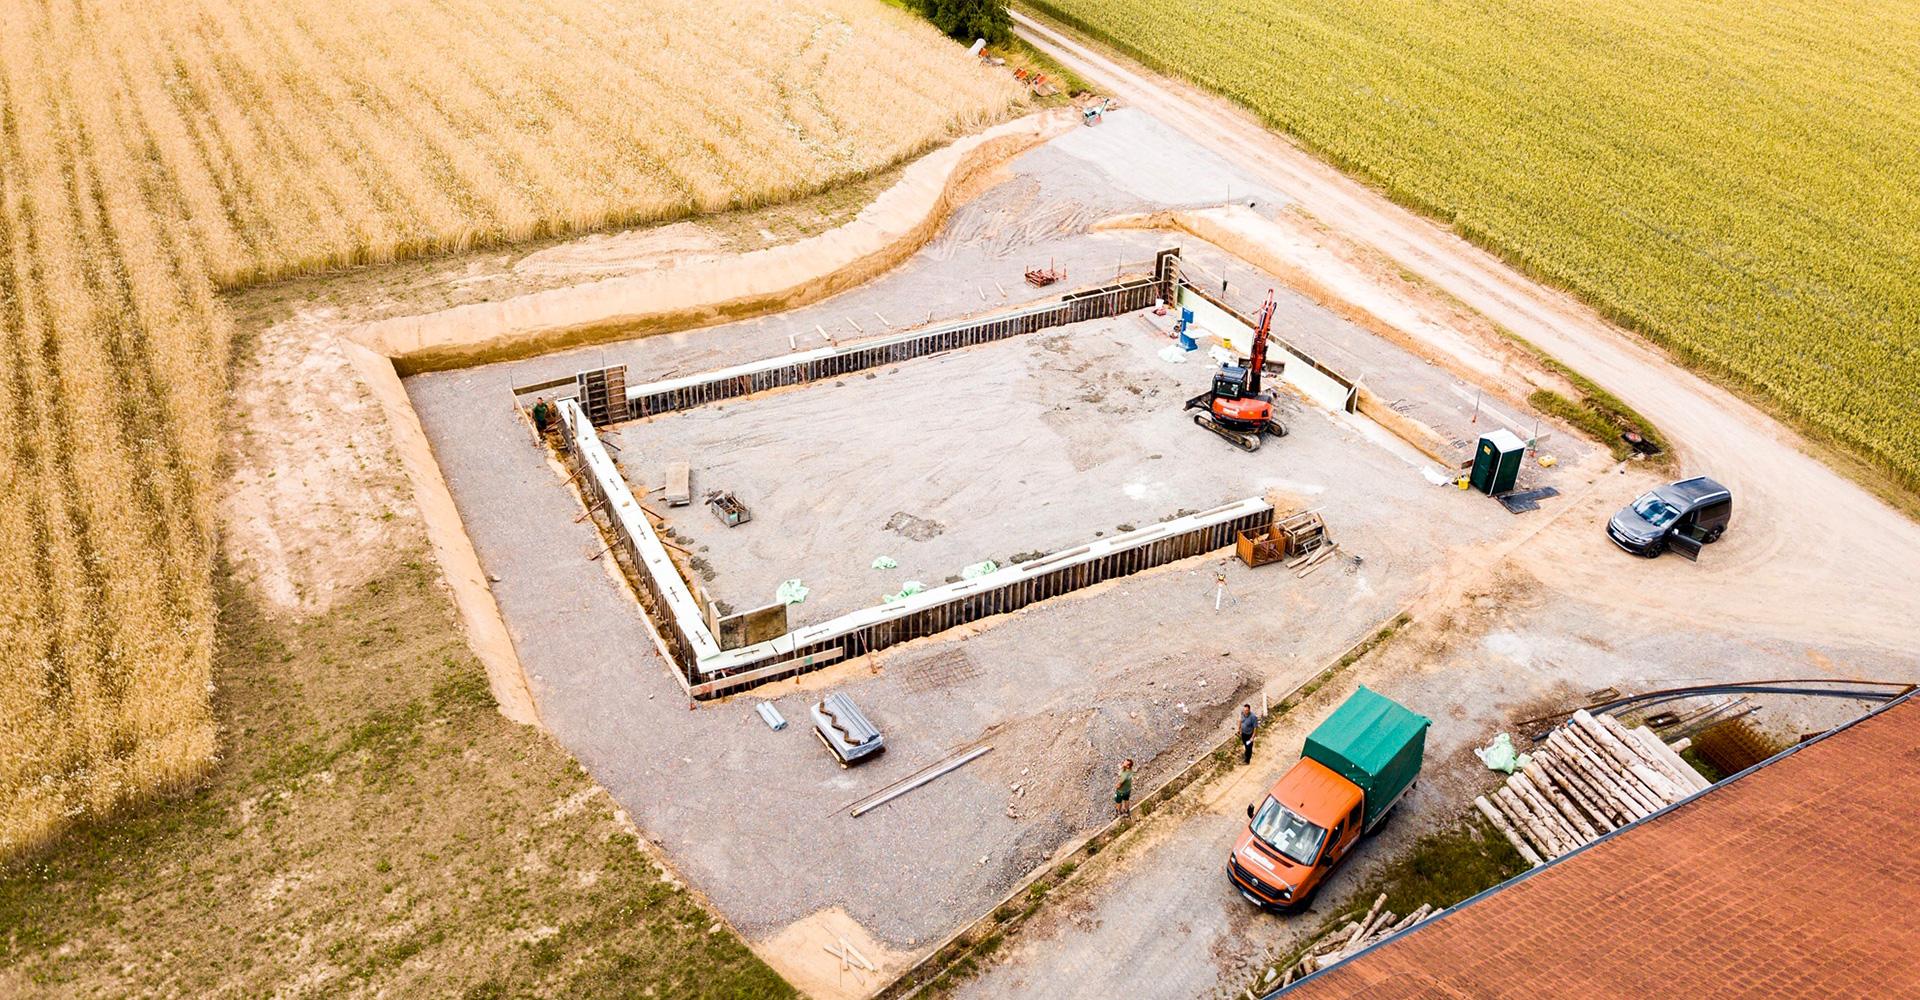 Kispert Bau GmbH aus Limbach